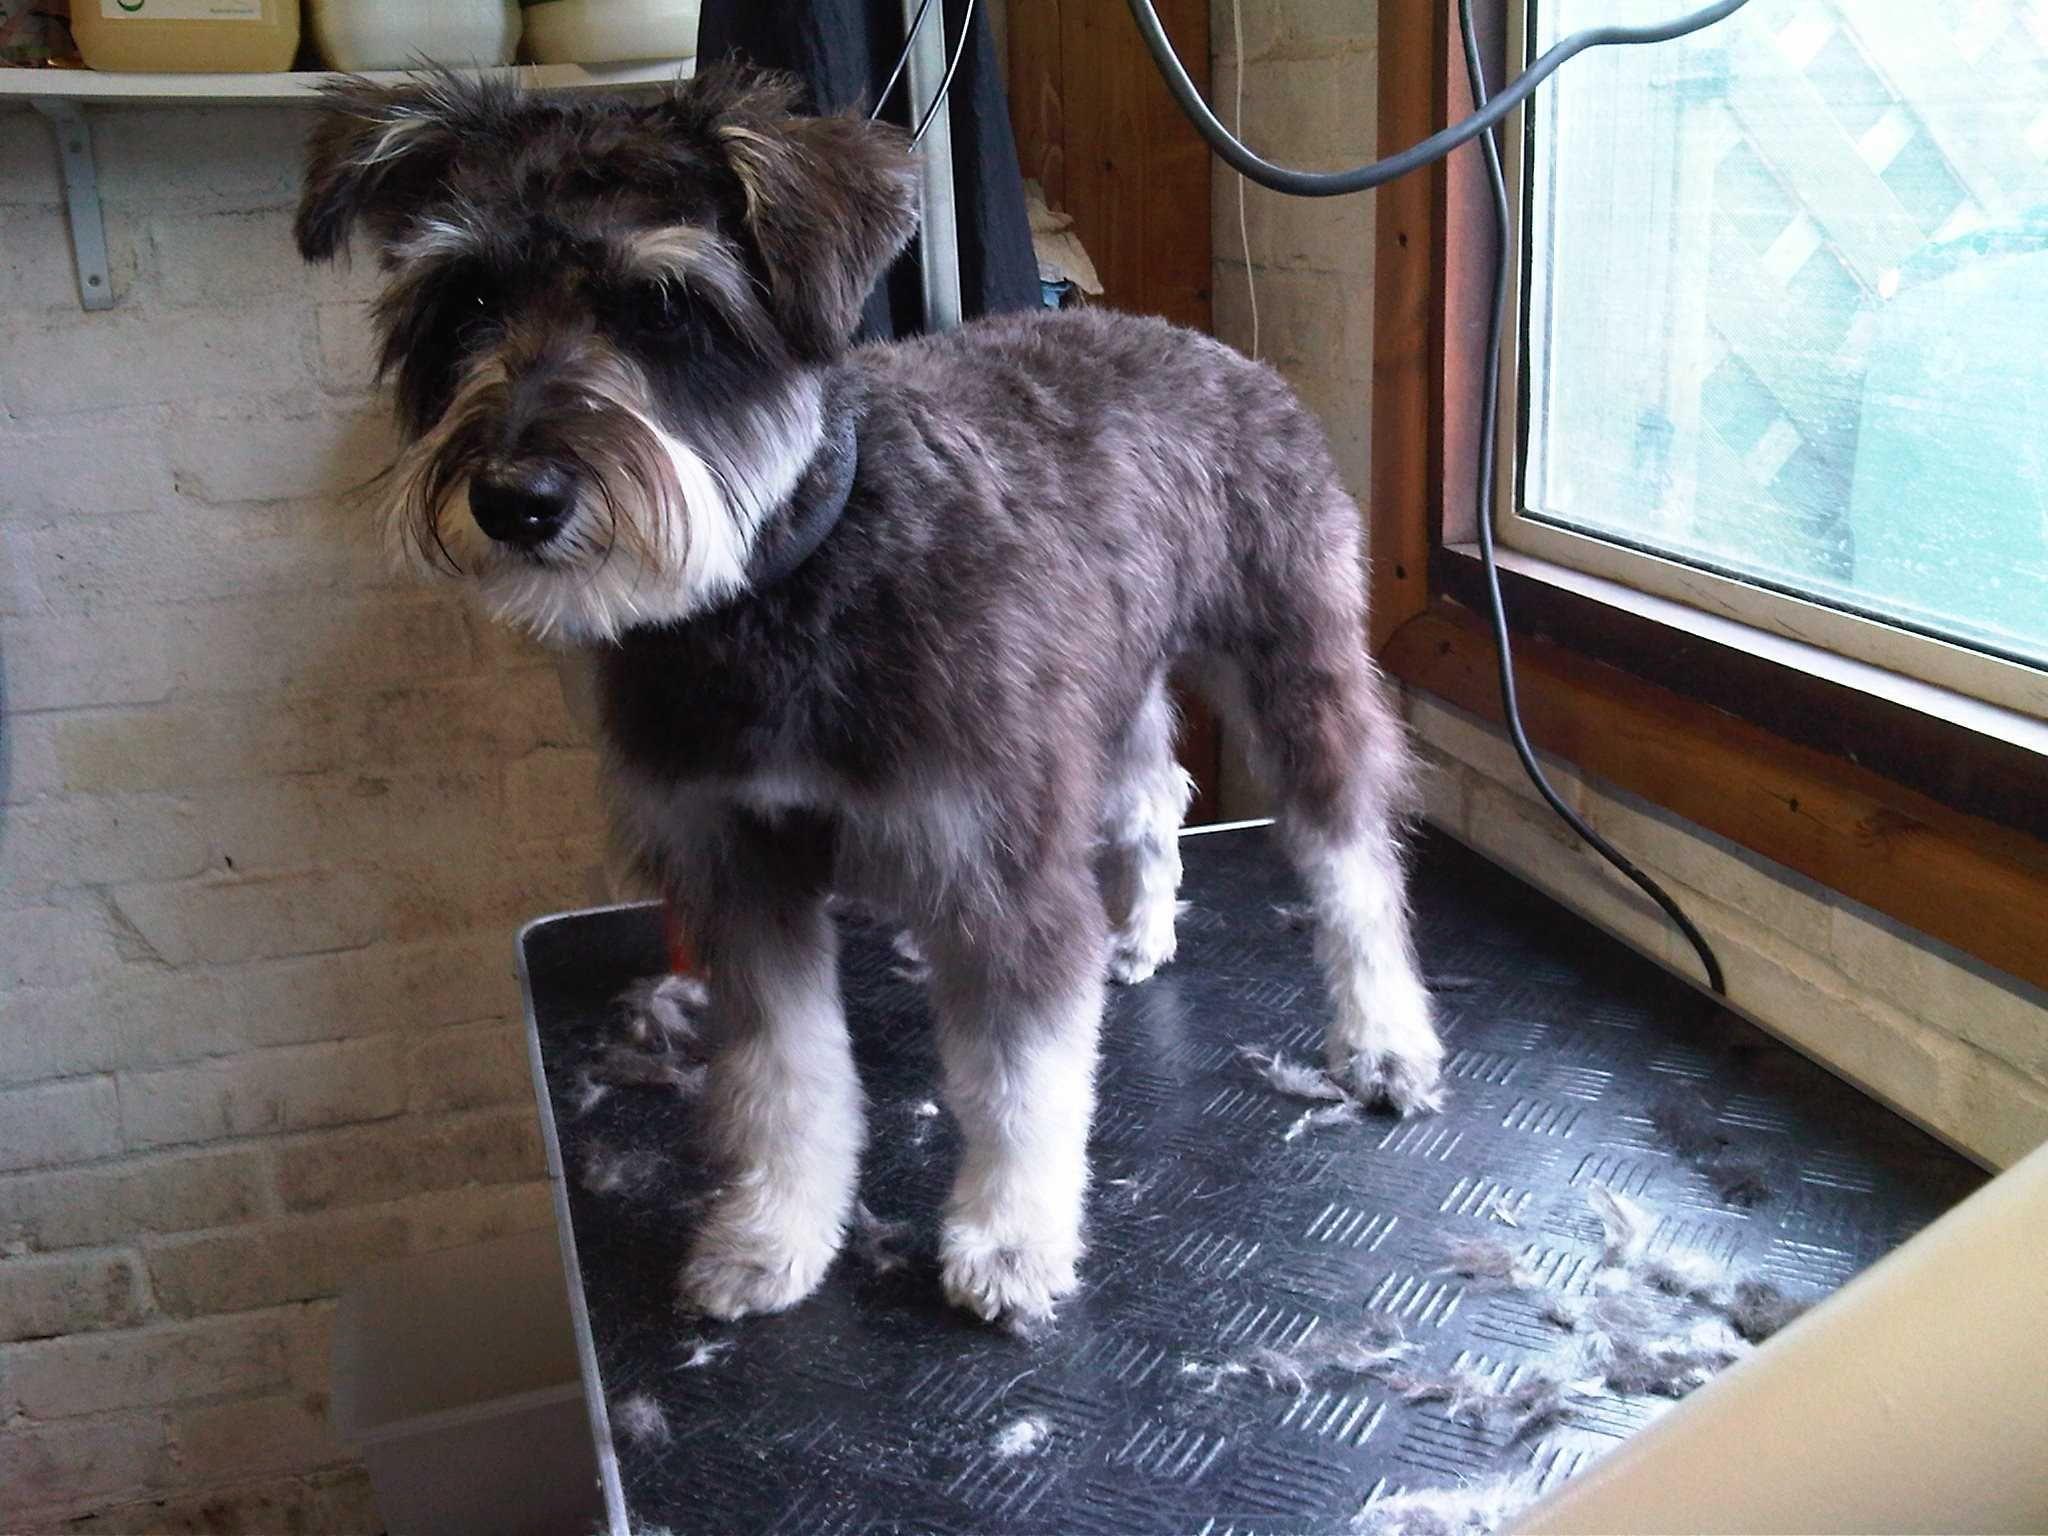 Miniature Schnauzer Hair Styles: Miniature Schnauzer Puppy Cut Grooming